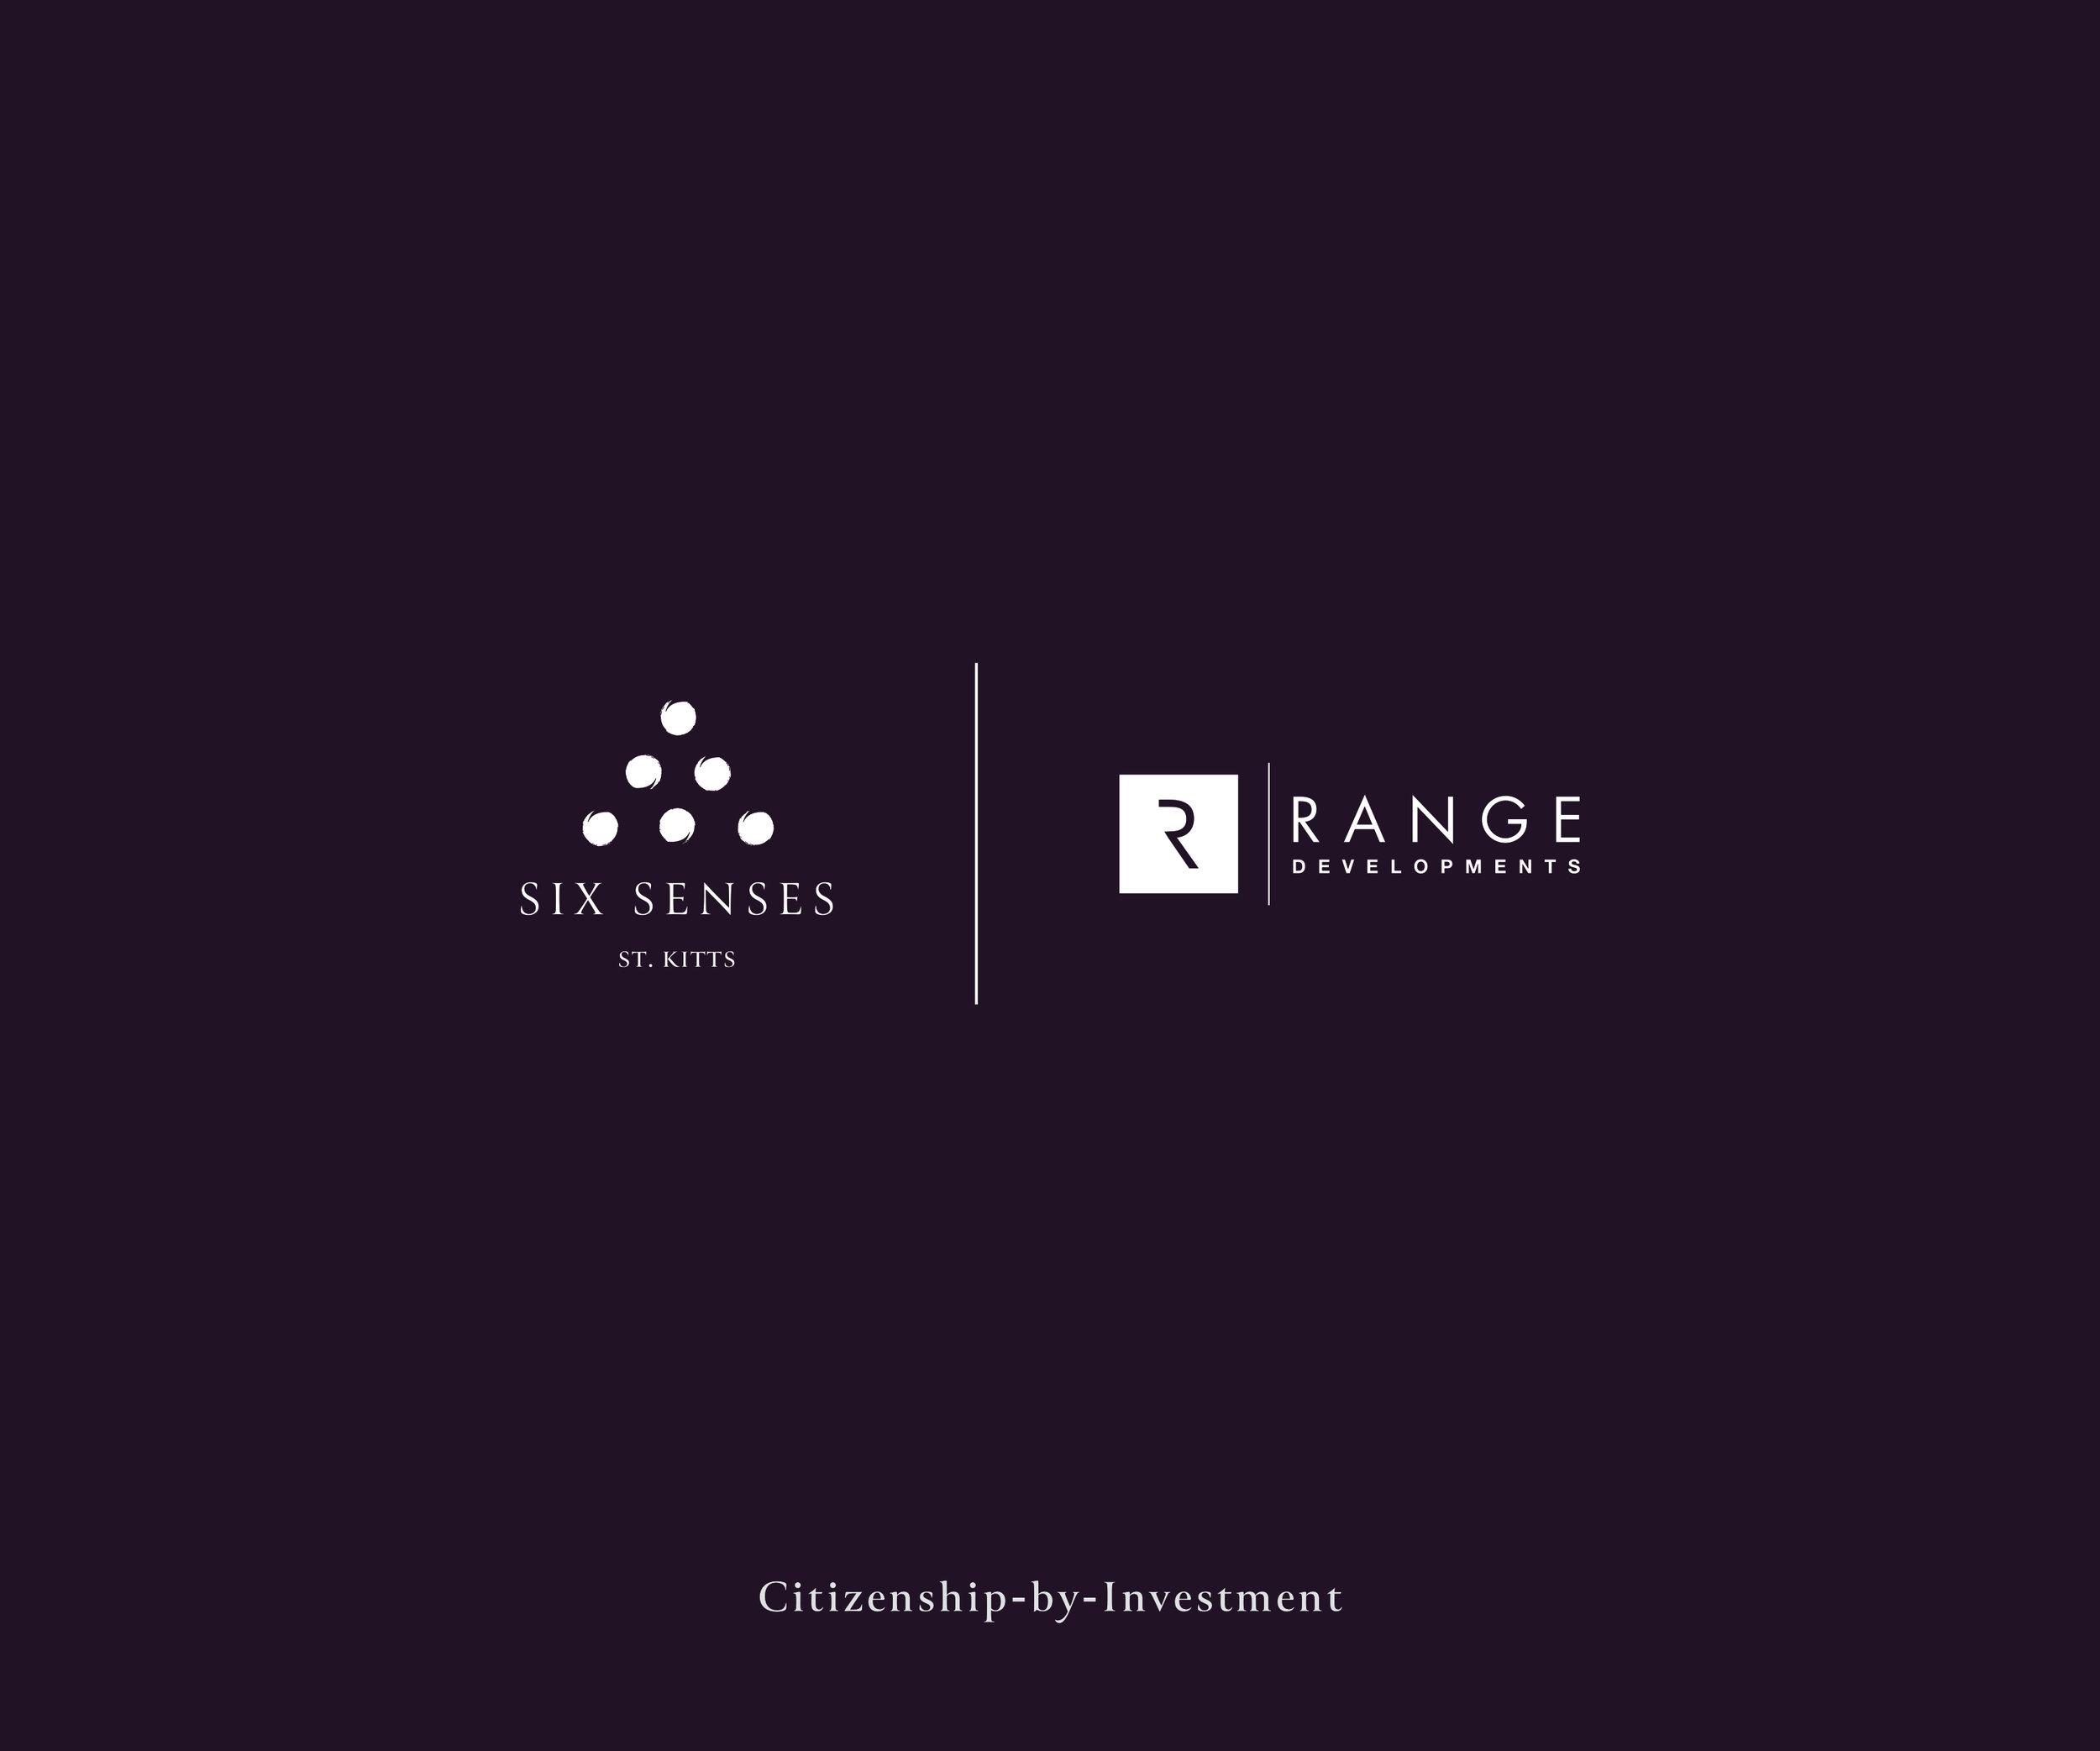 Range Development_Six Senses St. Kitts_Sales Brochure_rev 11 A4 (digital).jpg